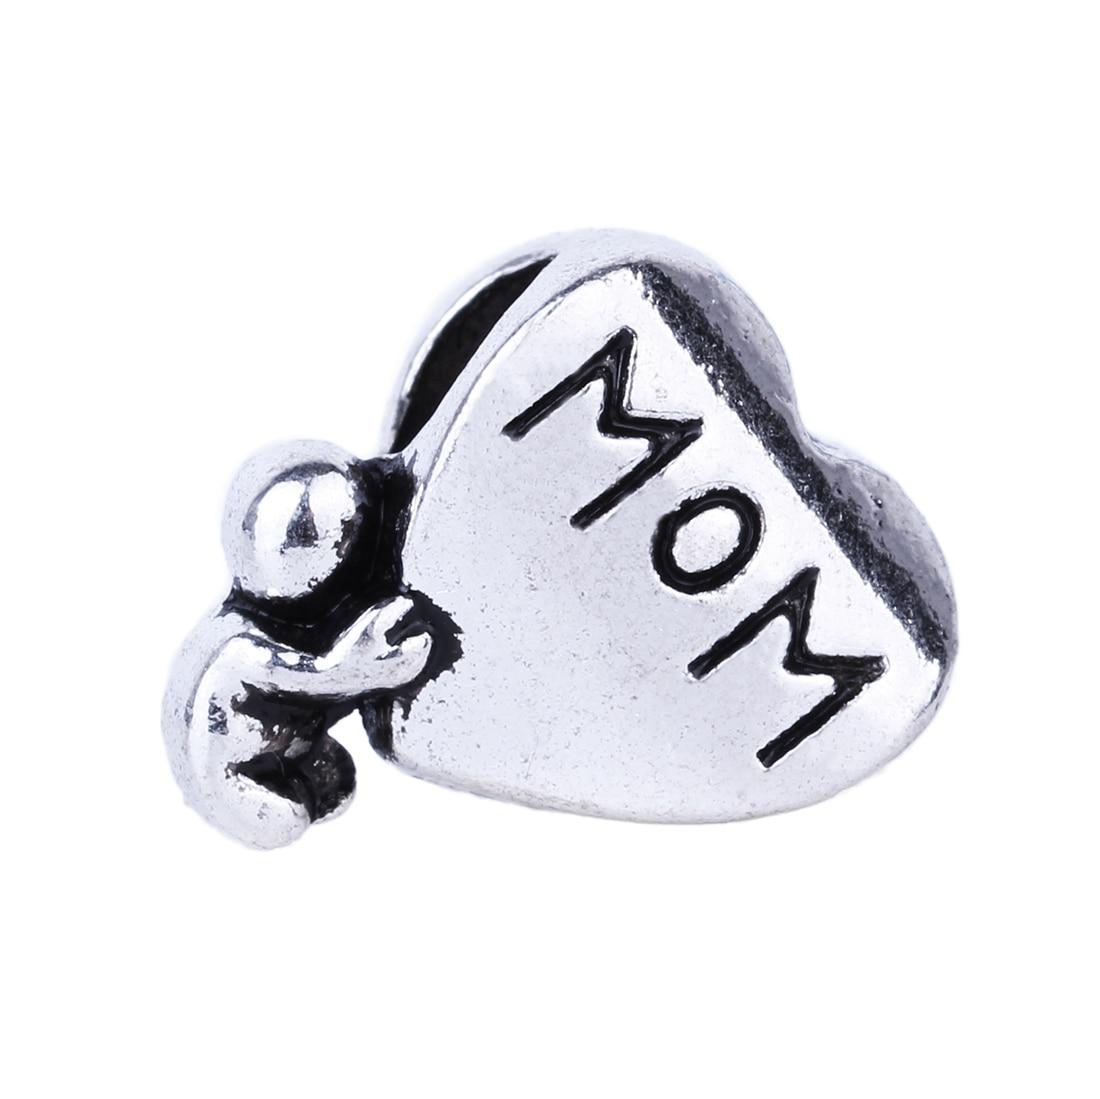 Free Shipping 1pc Silver Mom Heart Alloy Bead DIY European Big Hole Beads Fits Charm Pandora Bracelets Necklaces Pendants